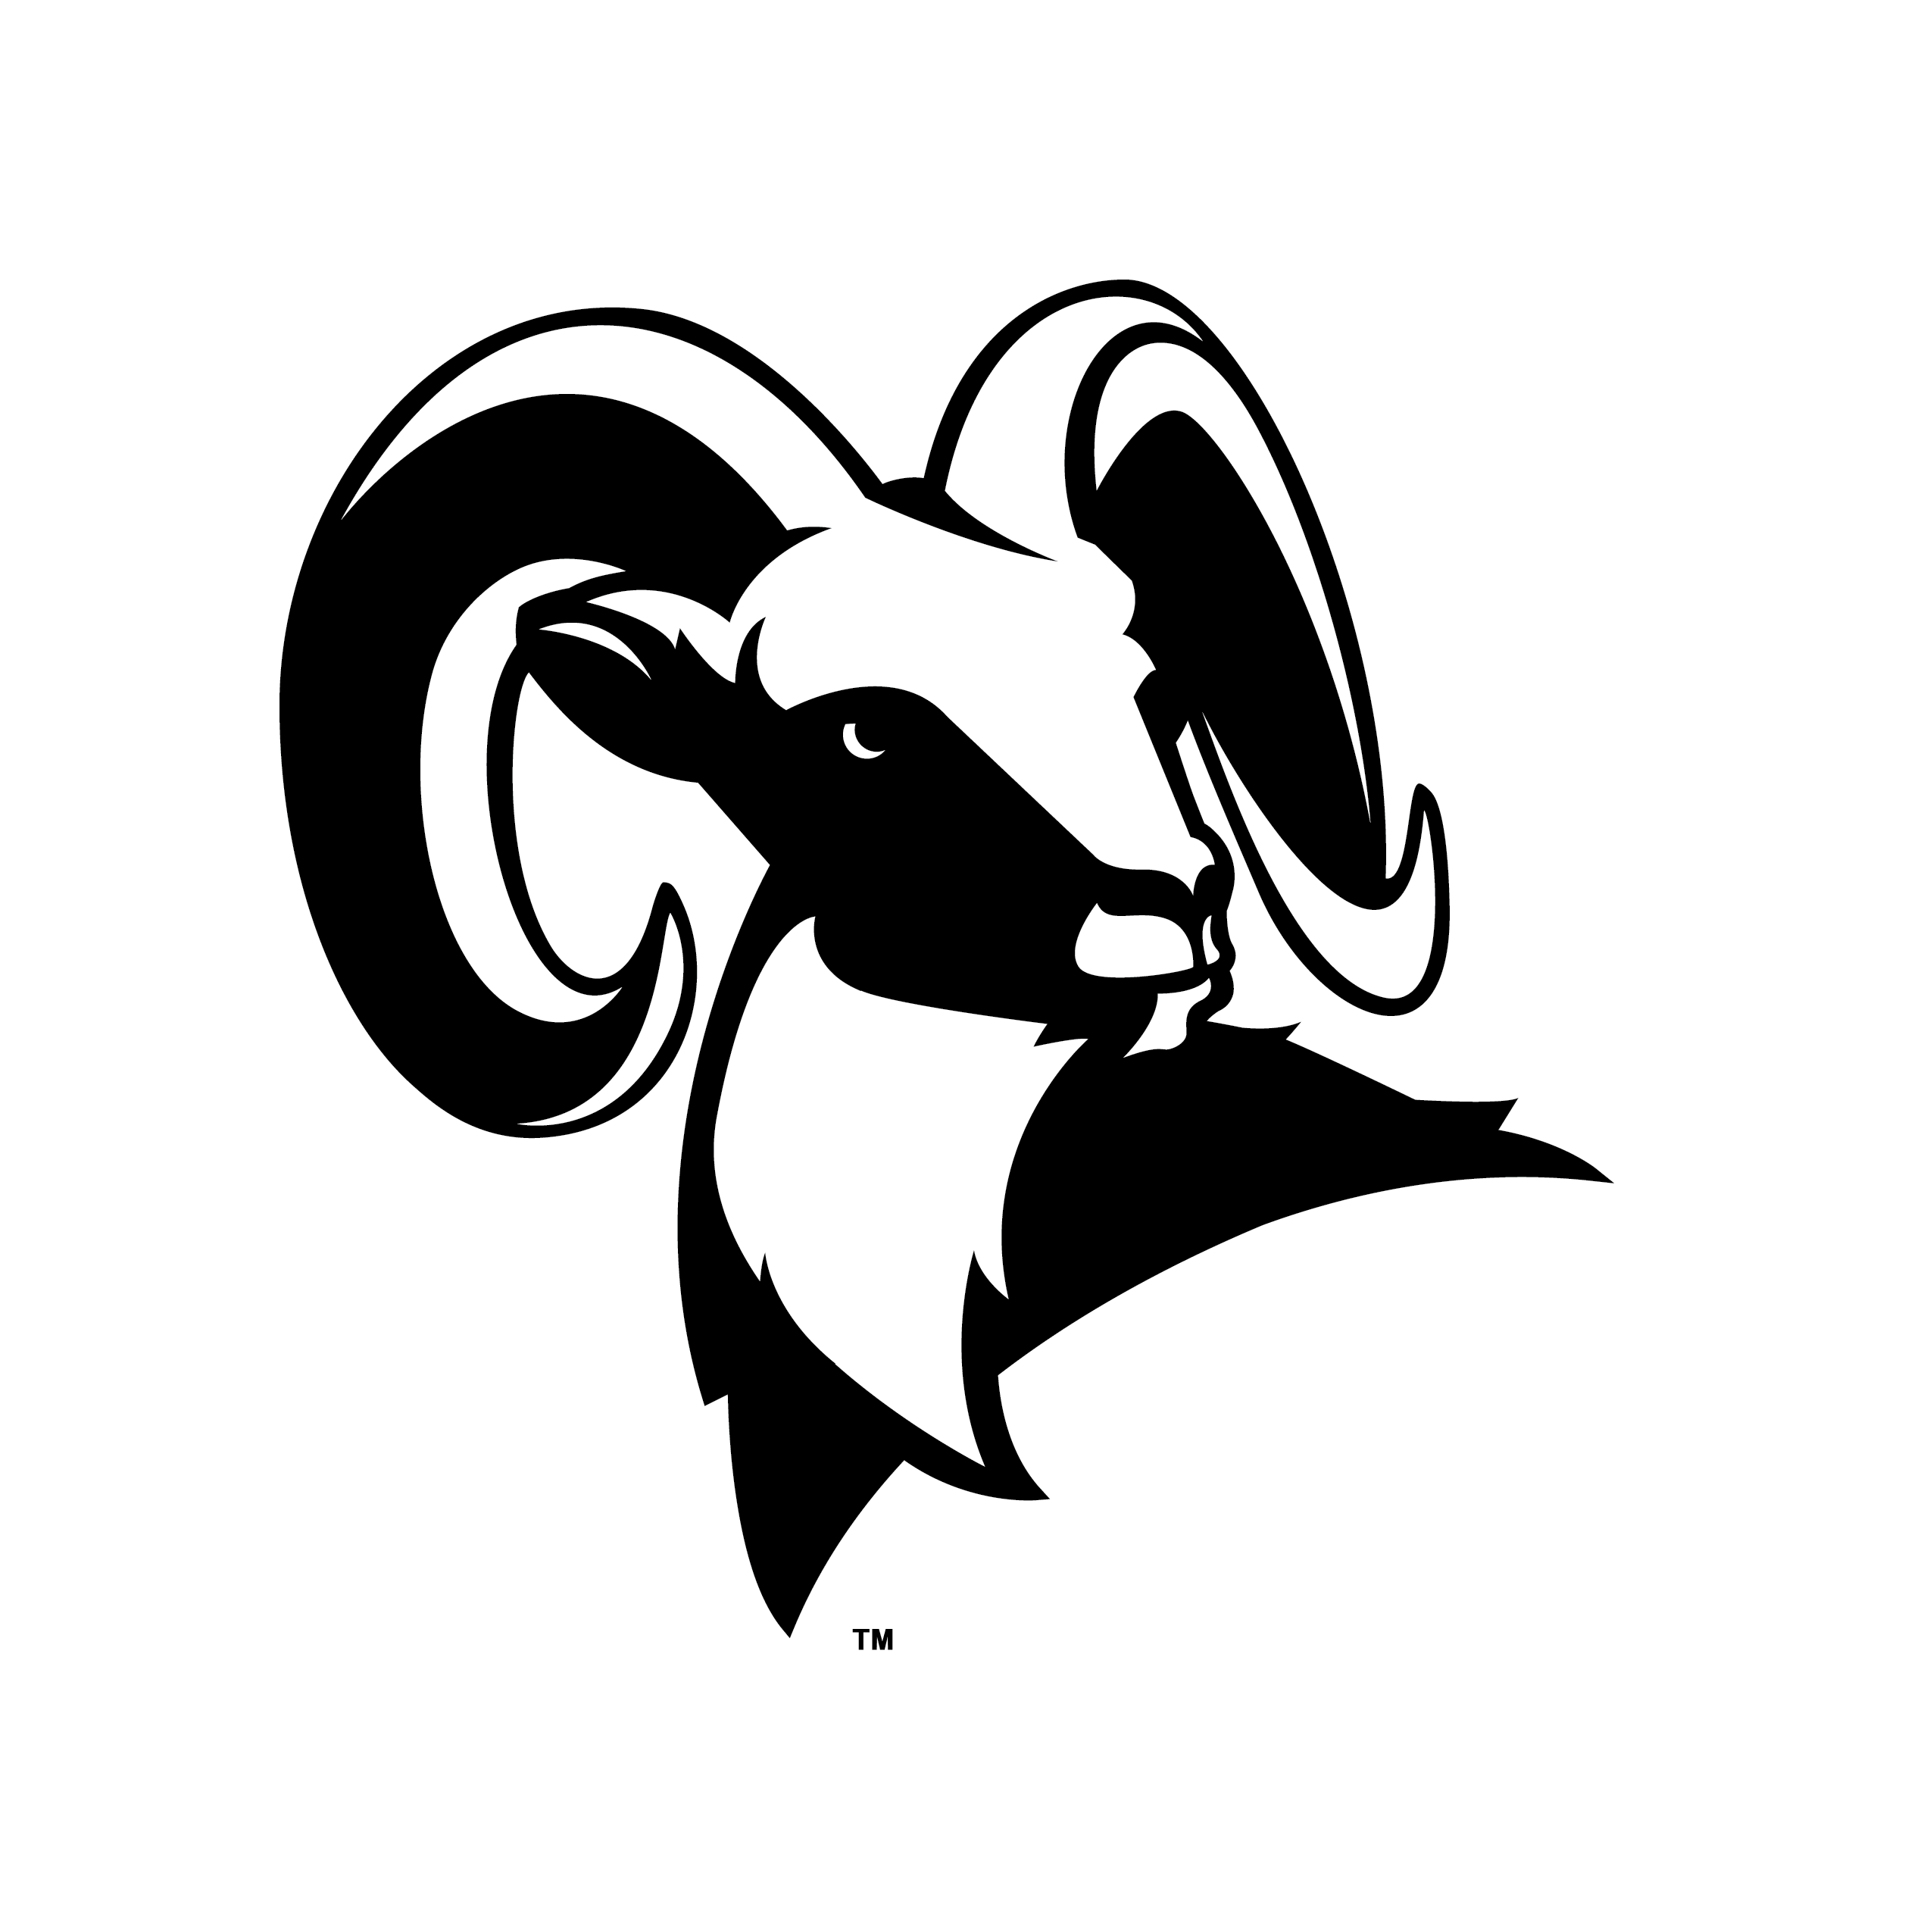 Ram Head Logo Clip Art free image.